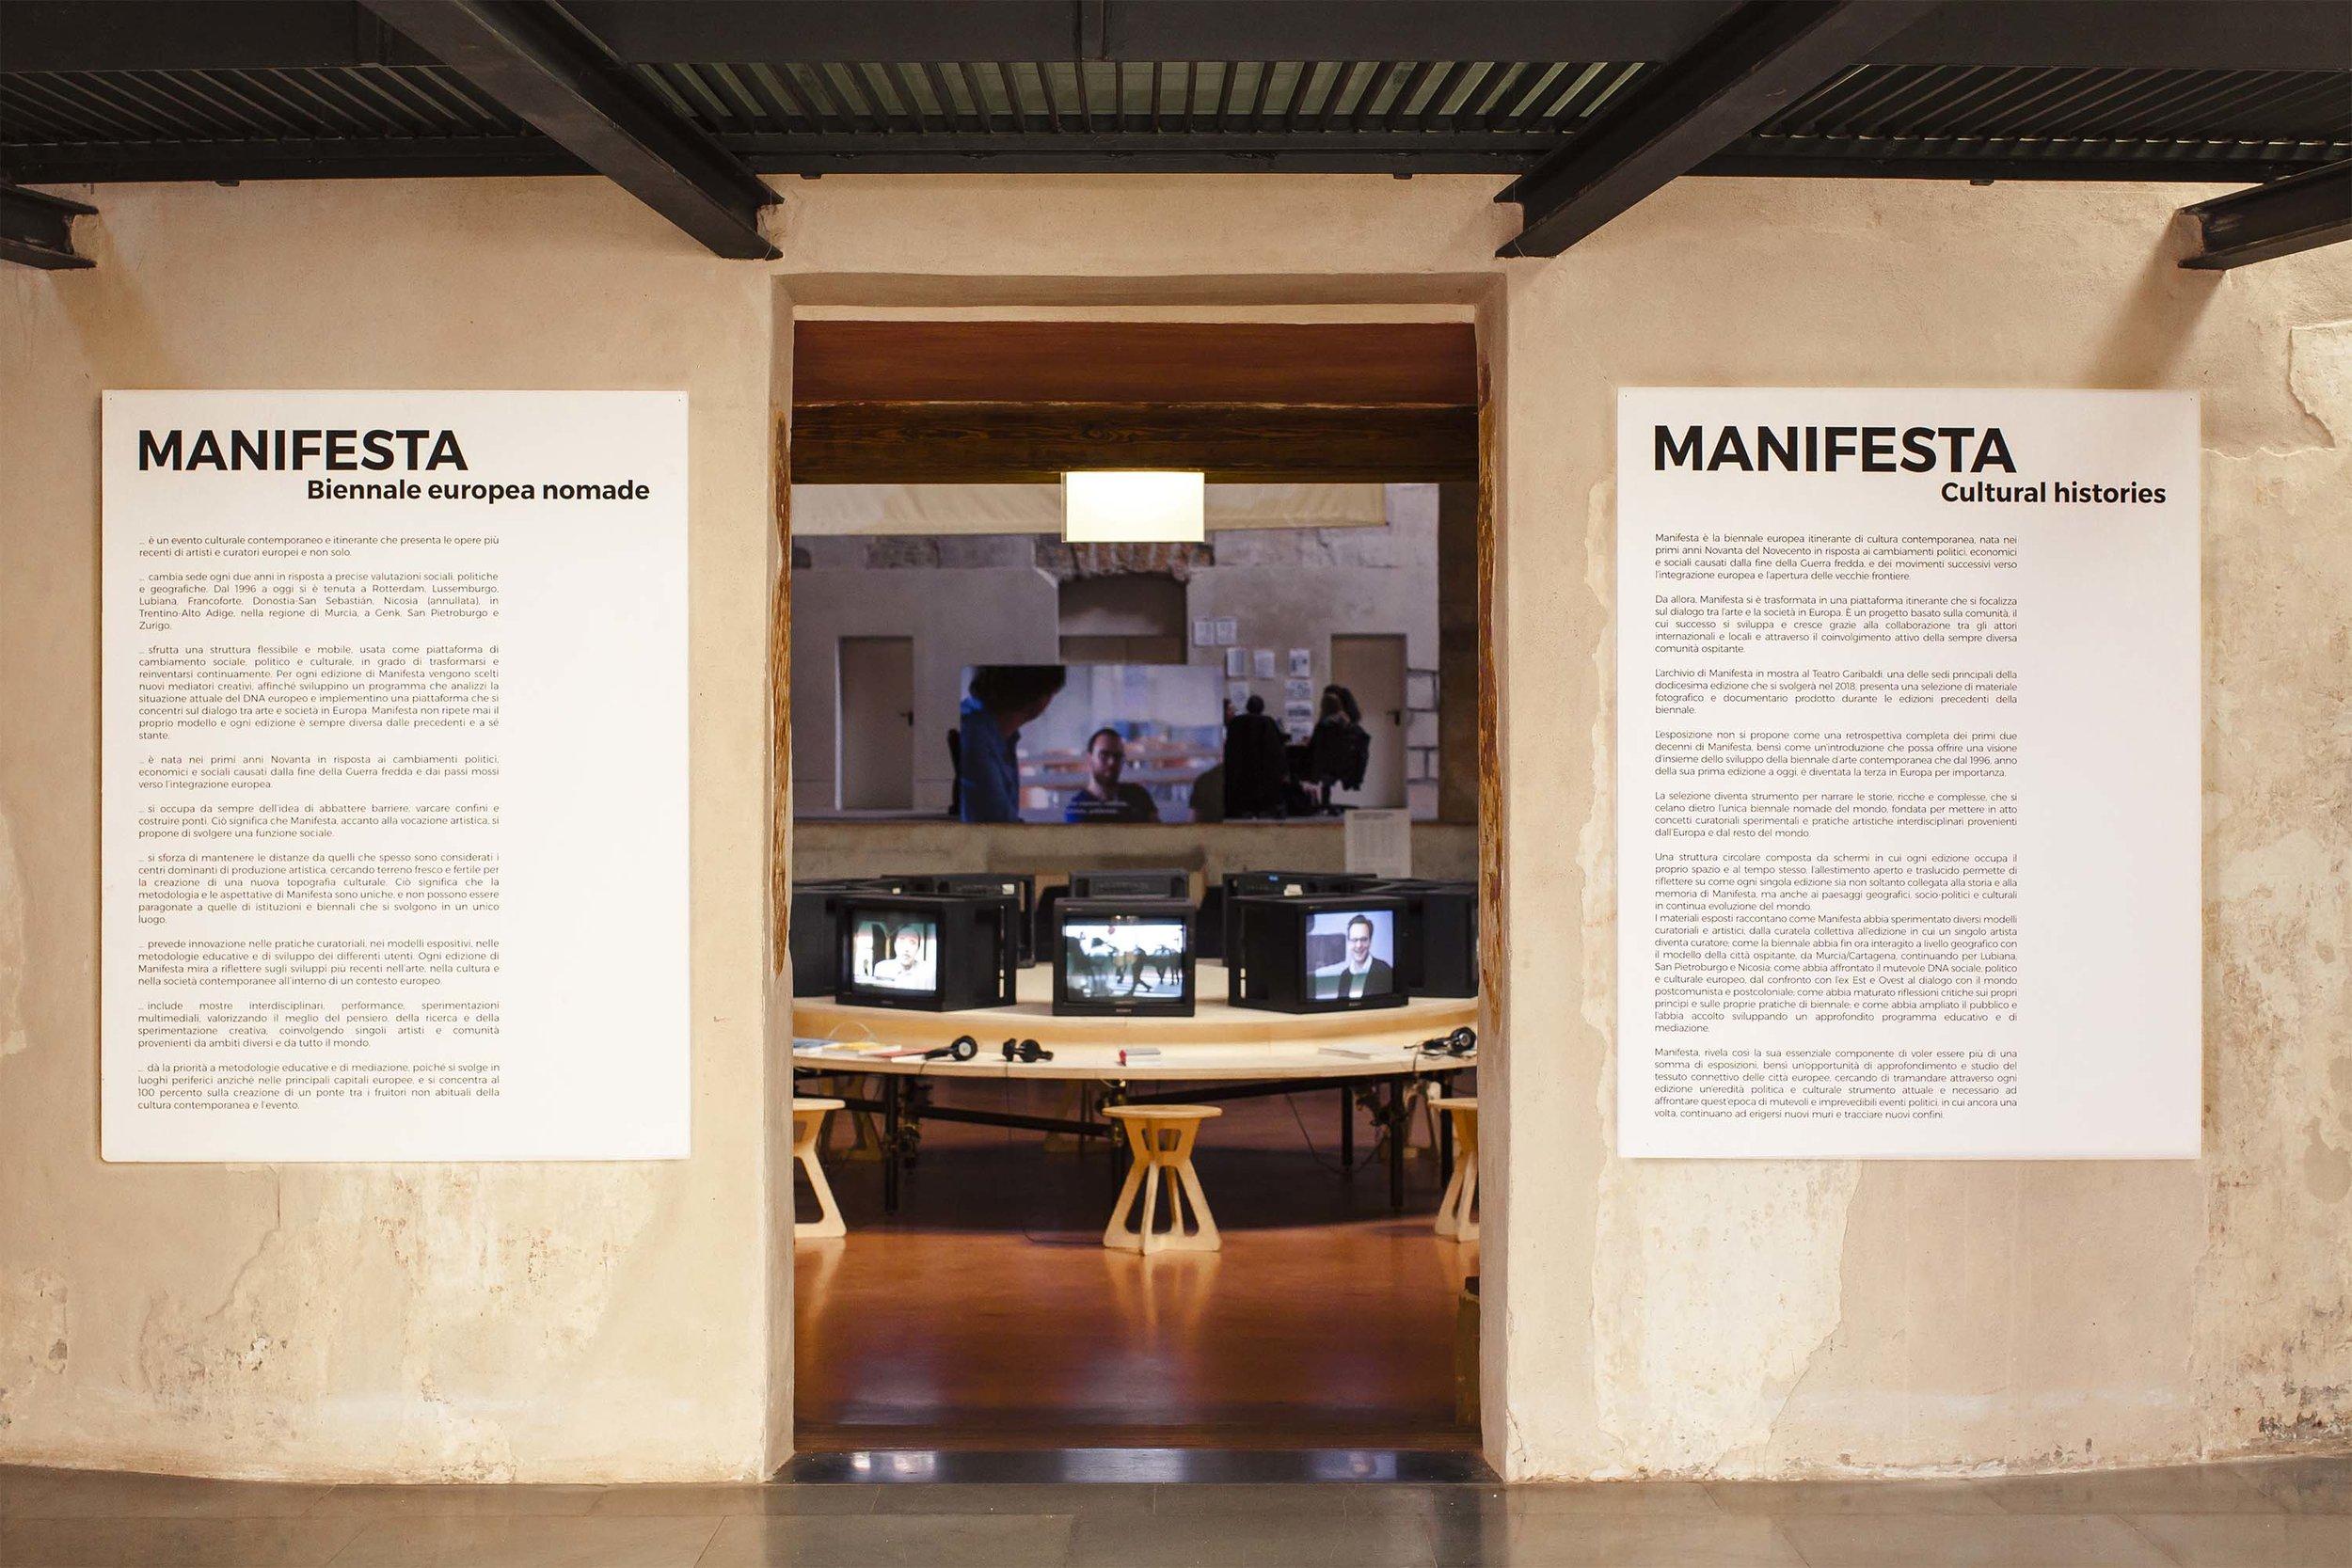 Aspettando Manifesta_Gallery-02.jpg